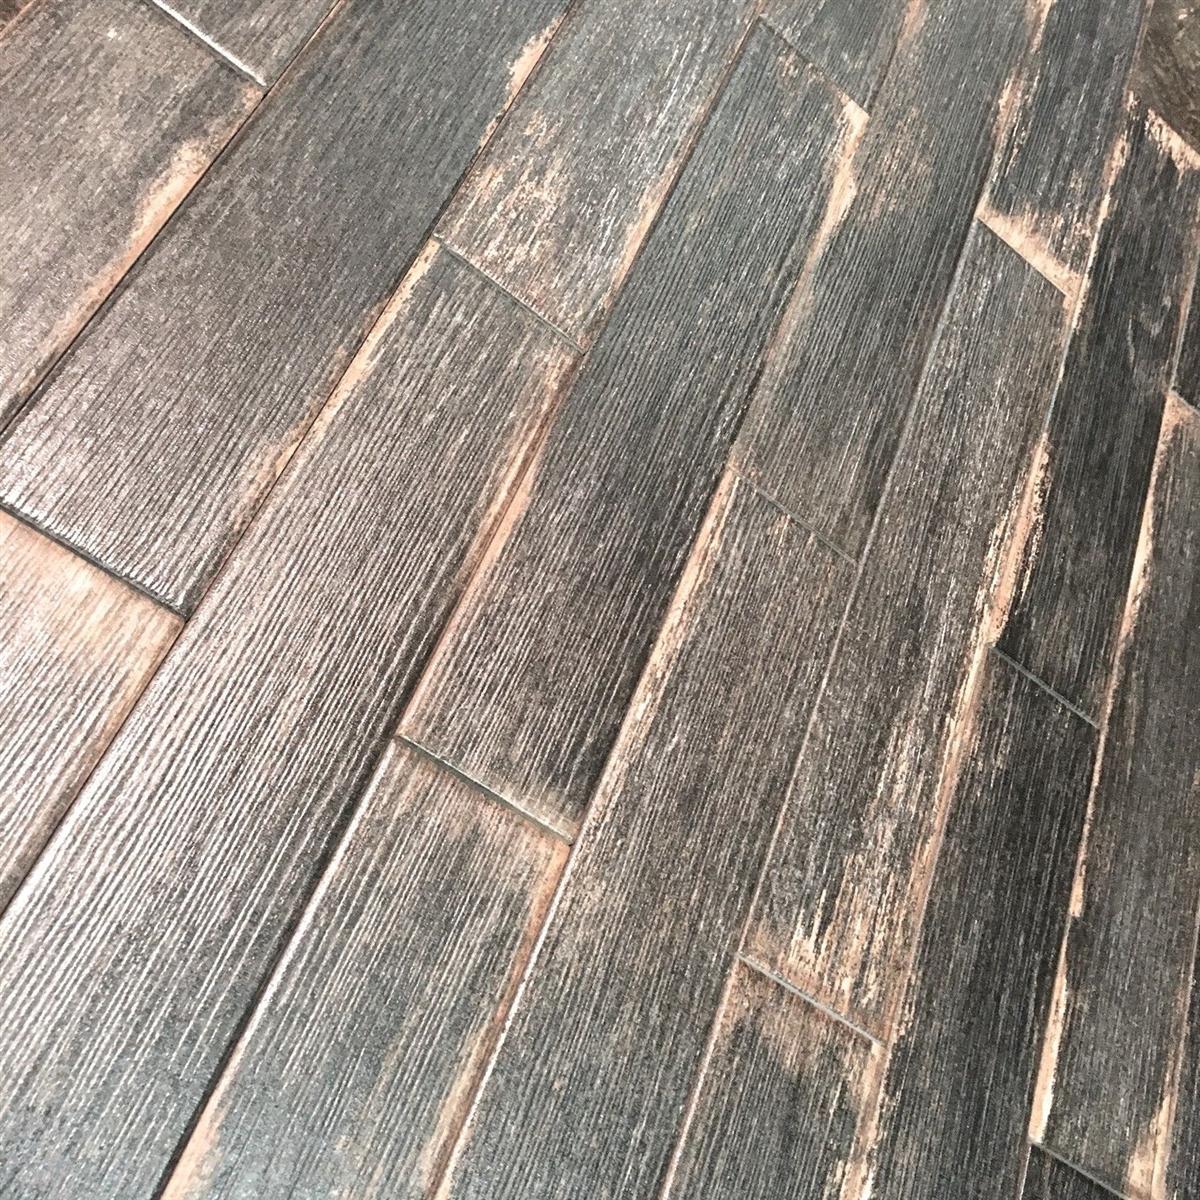 3 14 x 18 atelier series blackwood porcelain plank tile sold by the piece